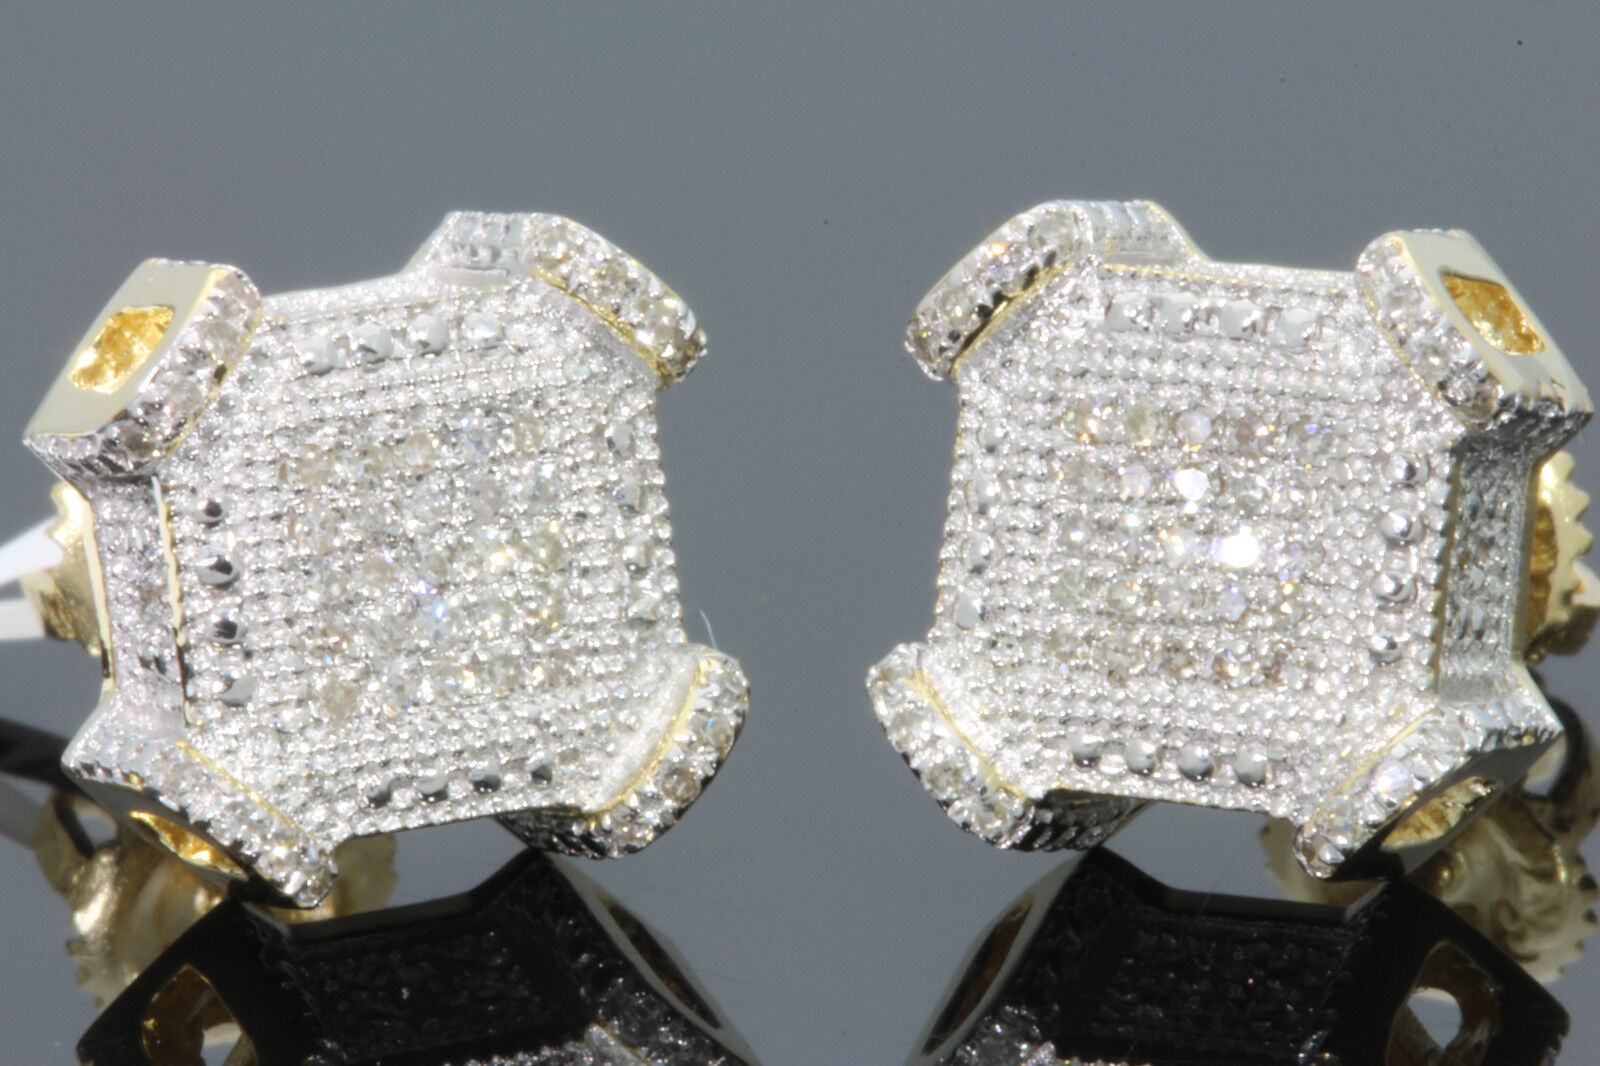 .29 CT STERLING SILVER GOLD FINISH MEN WOMEN 10 mm REAL DIAMONDS EARRINGS STUDS 1